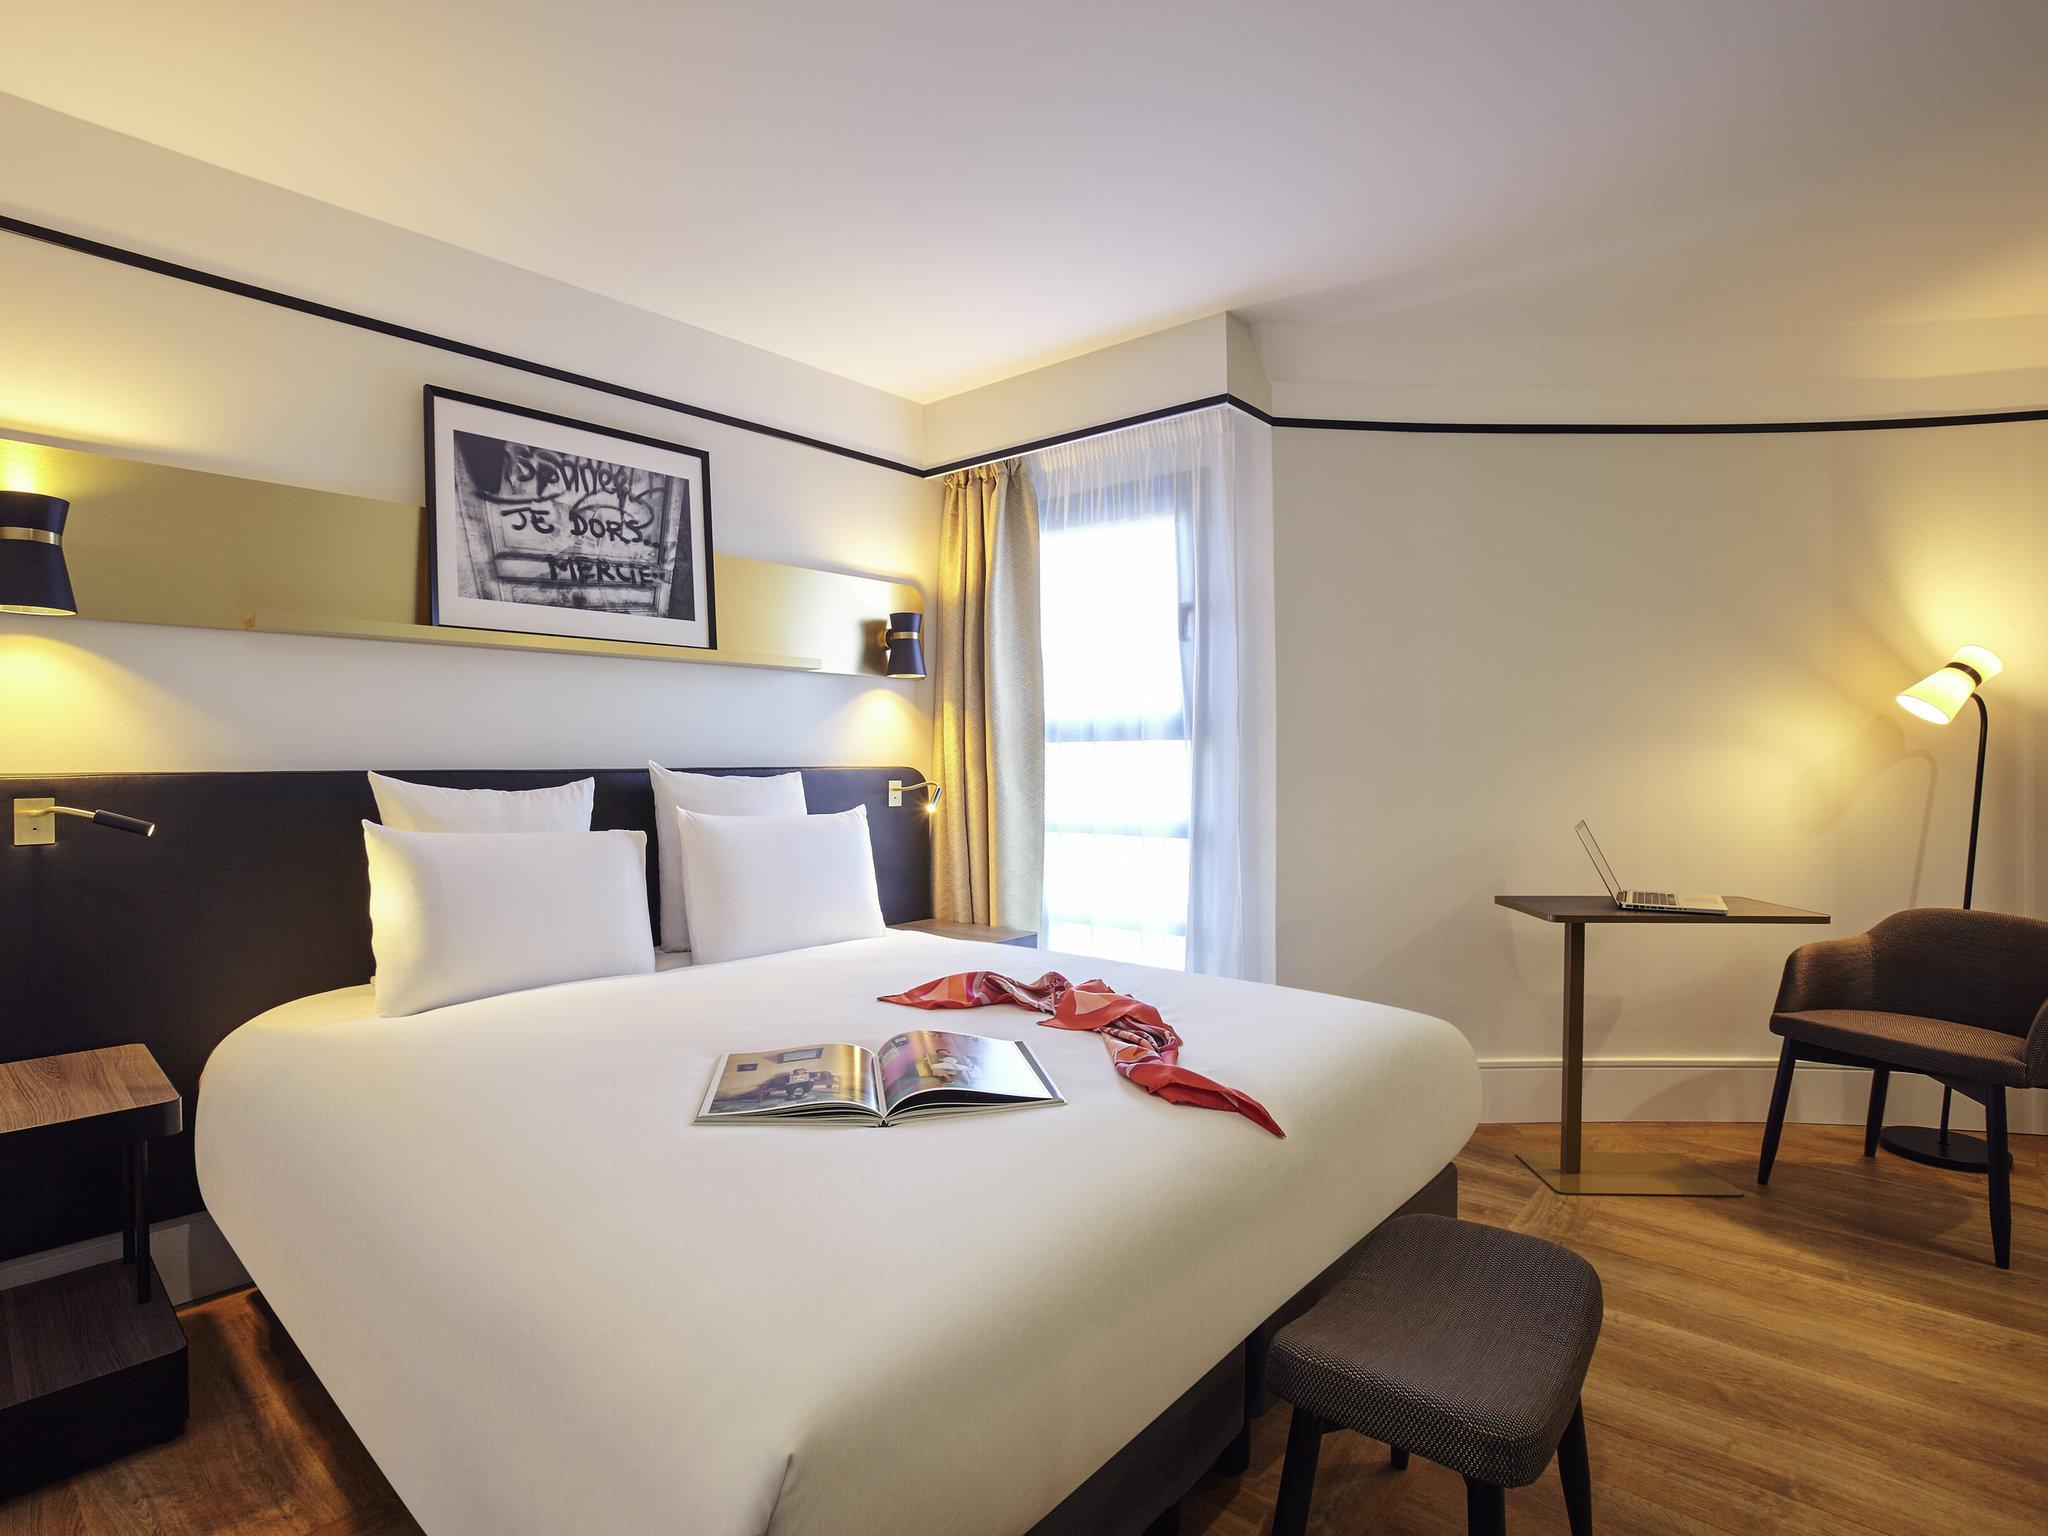 Отель — Hôtel Mercure Paris Saint-Ouen (ex Manhattan)